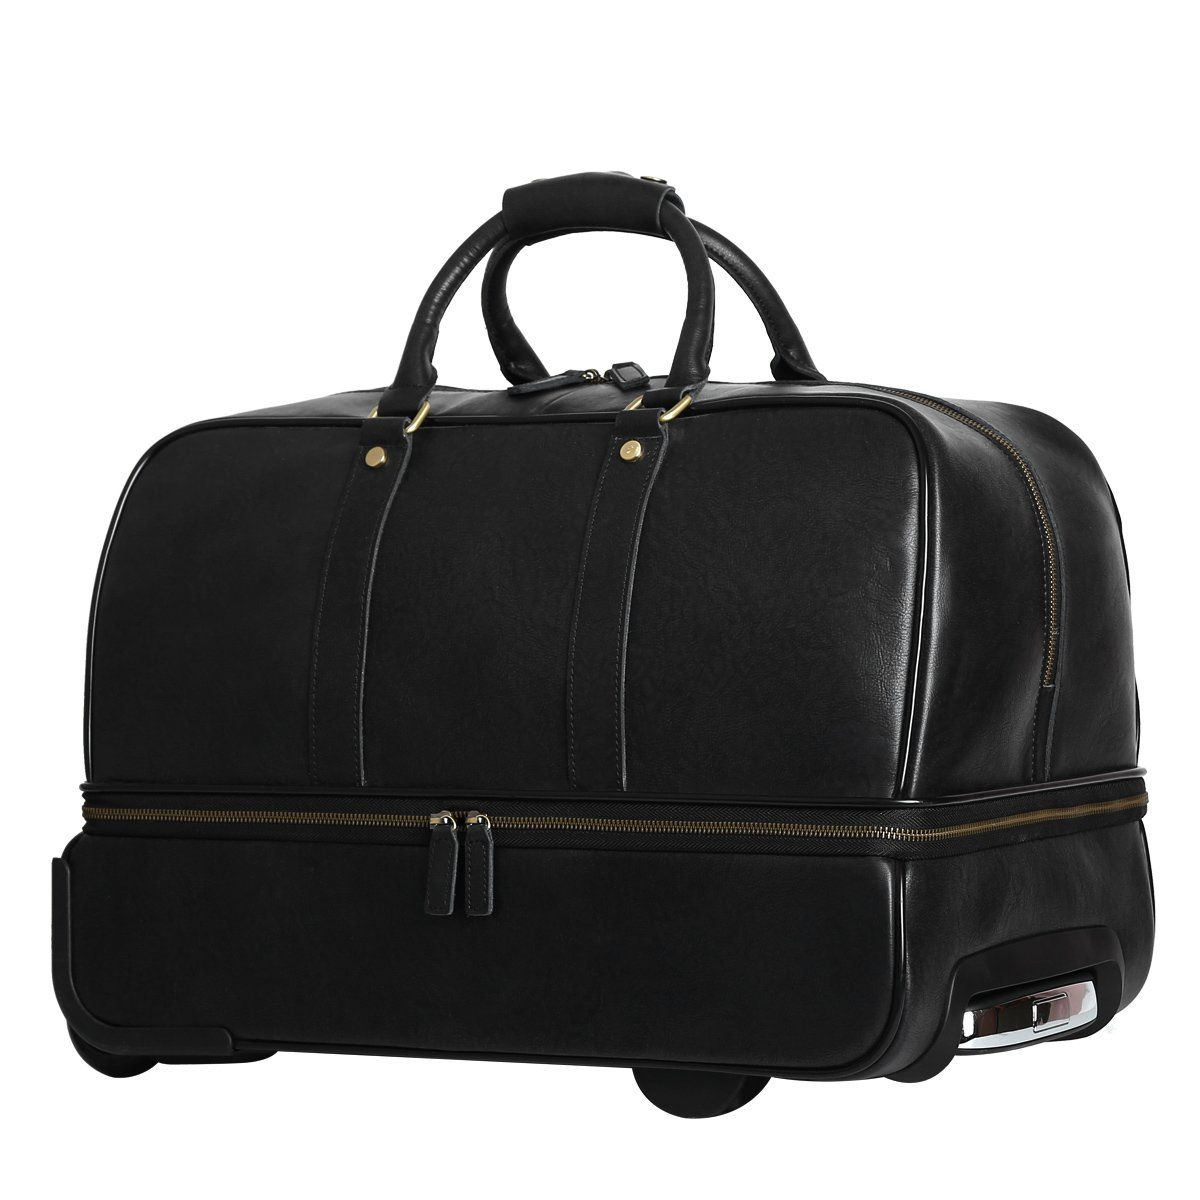 Leathario Men's Leather Luggage Wheeled Duffle, Leather Travel Bag (Black) by Leathario (Image #2)